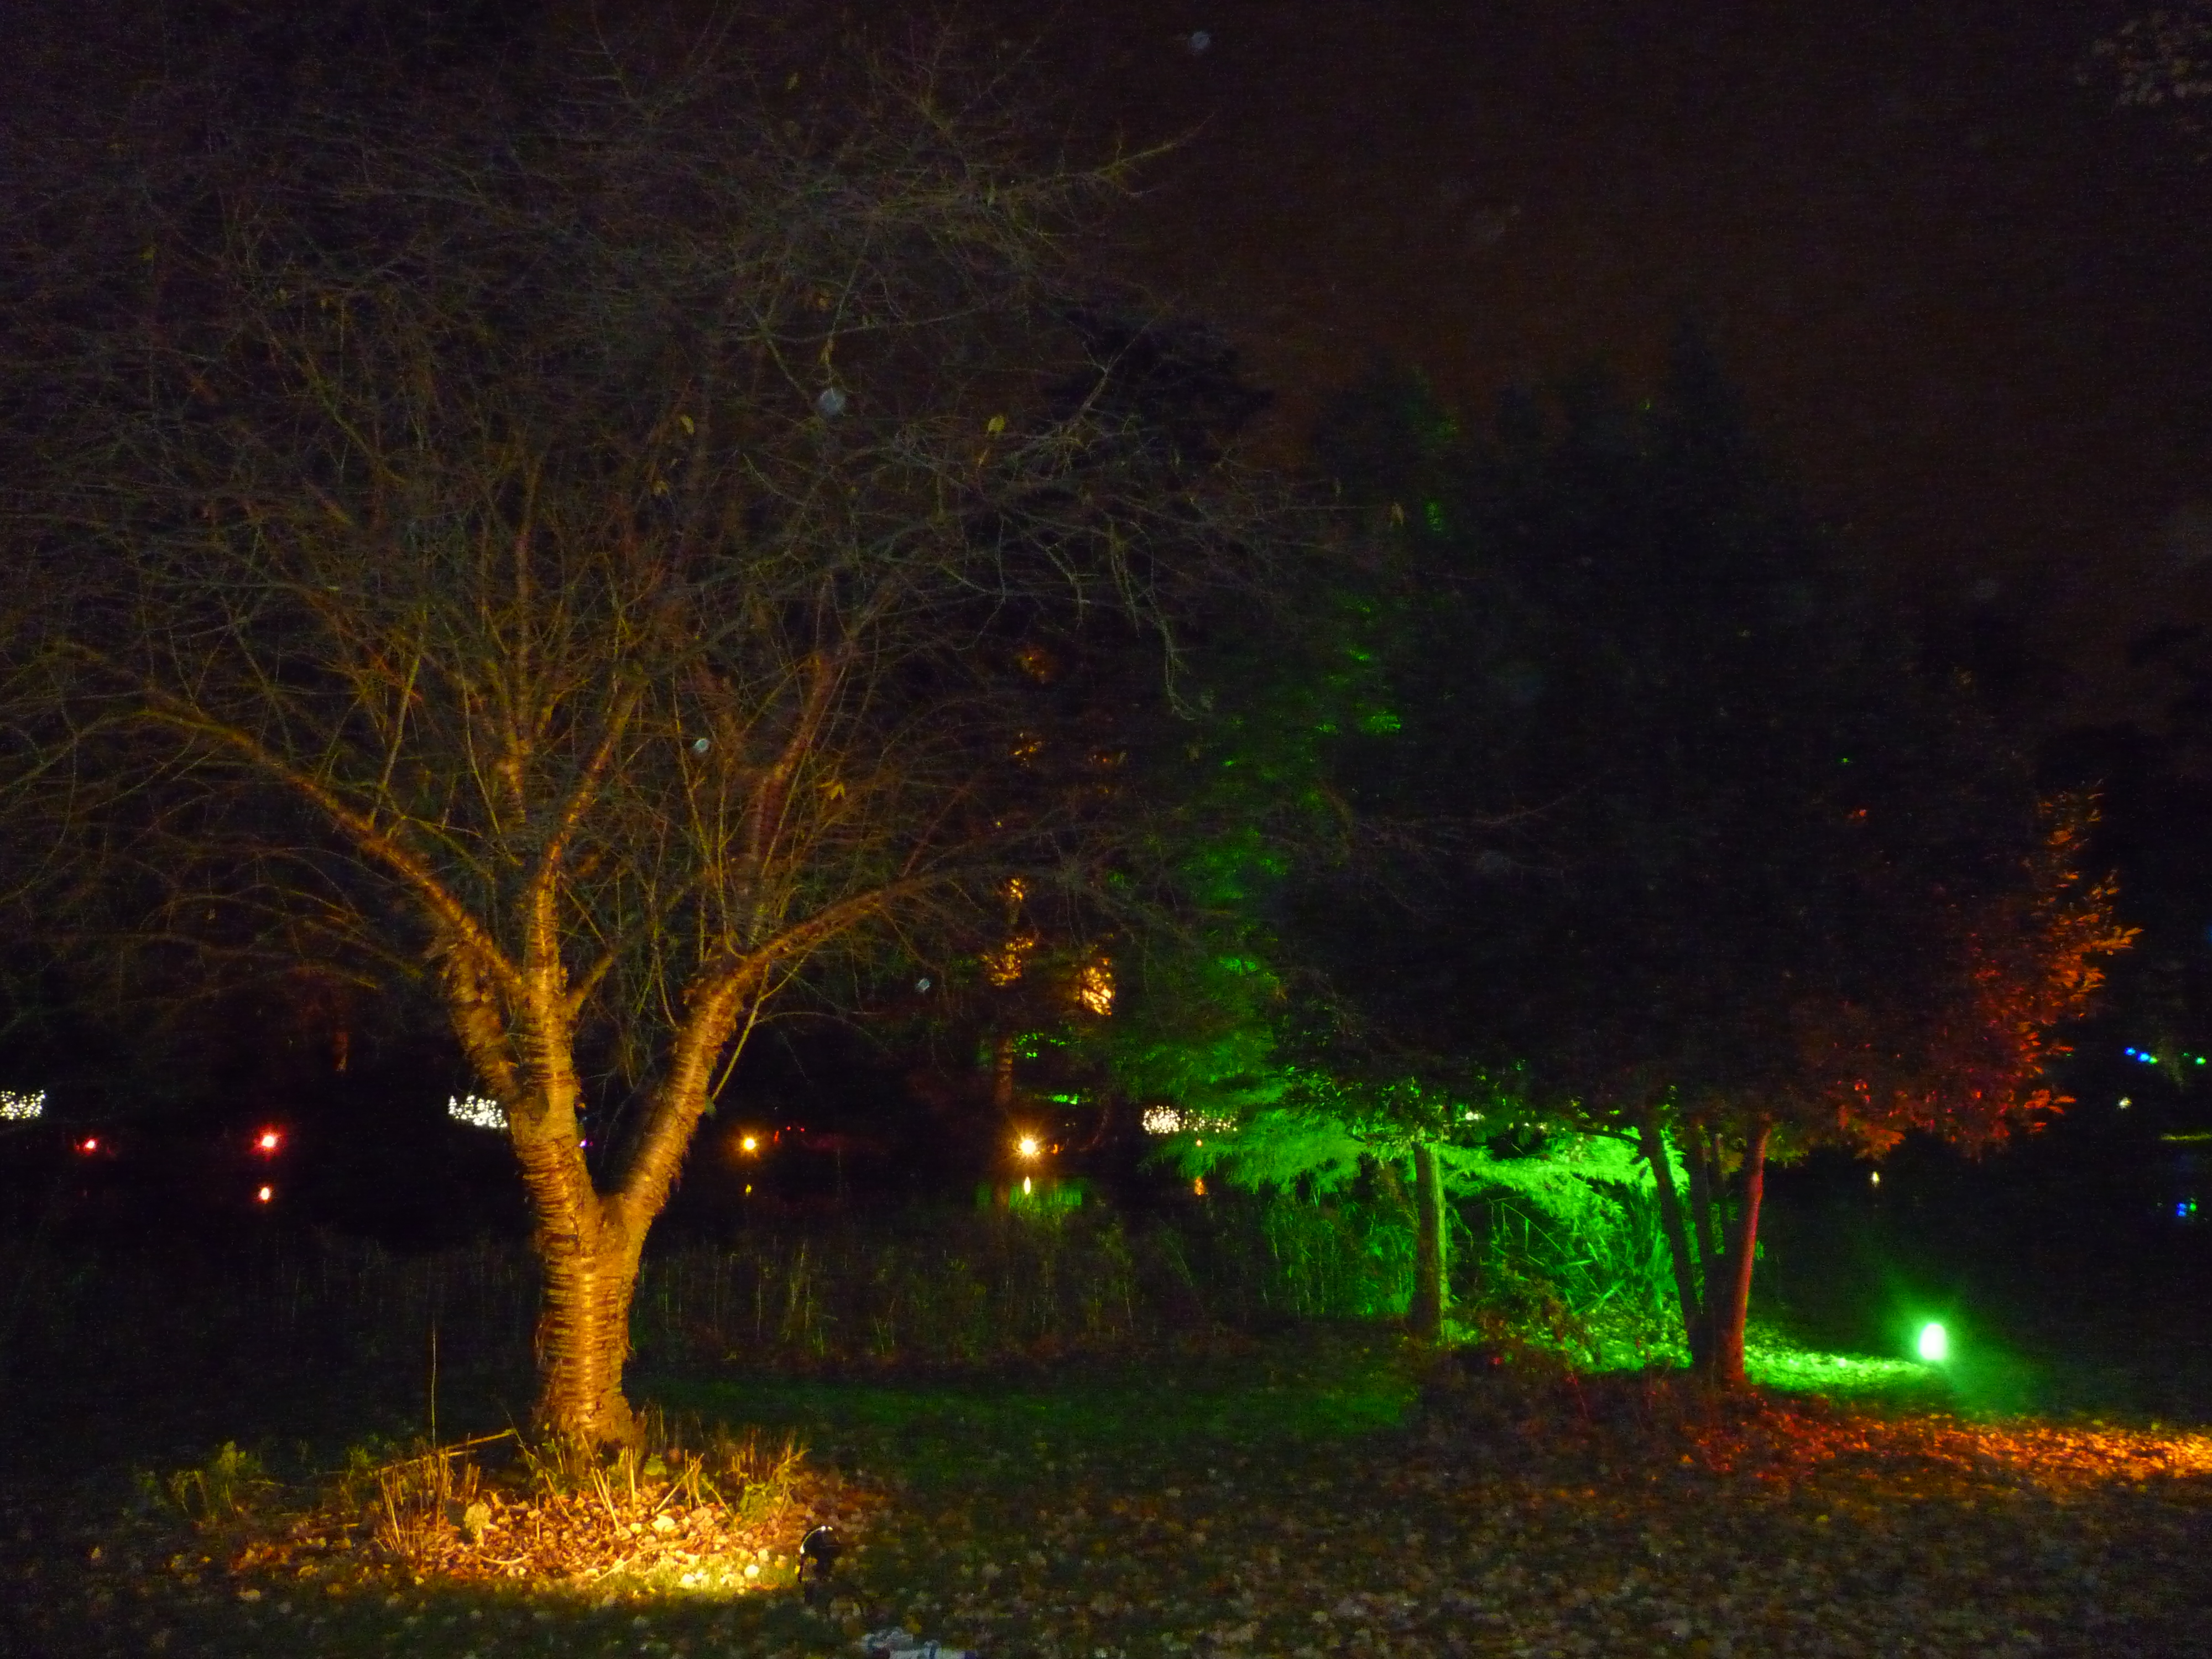 A Walk through an Enchanted Woodland - perspectives